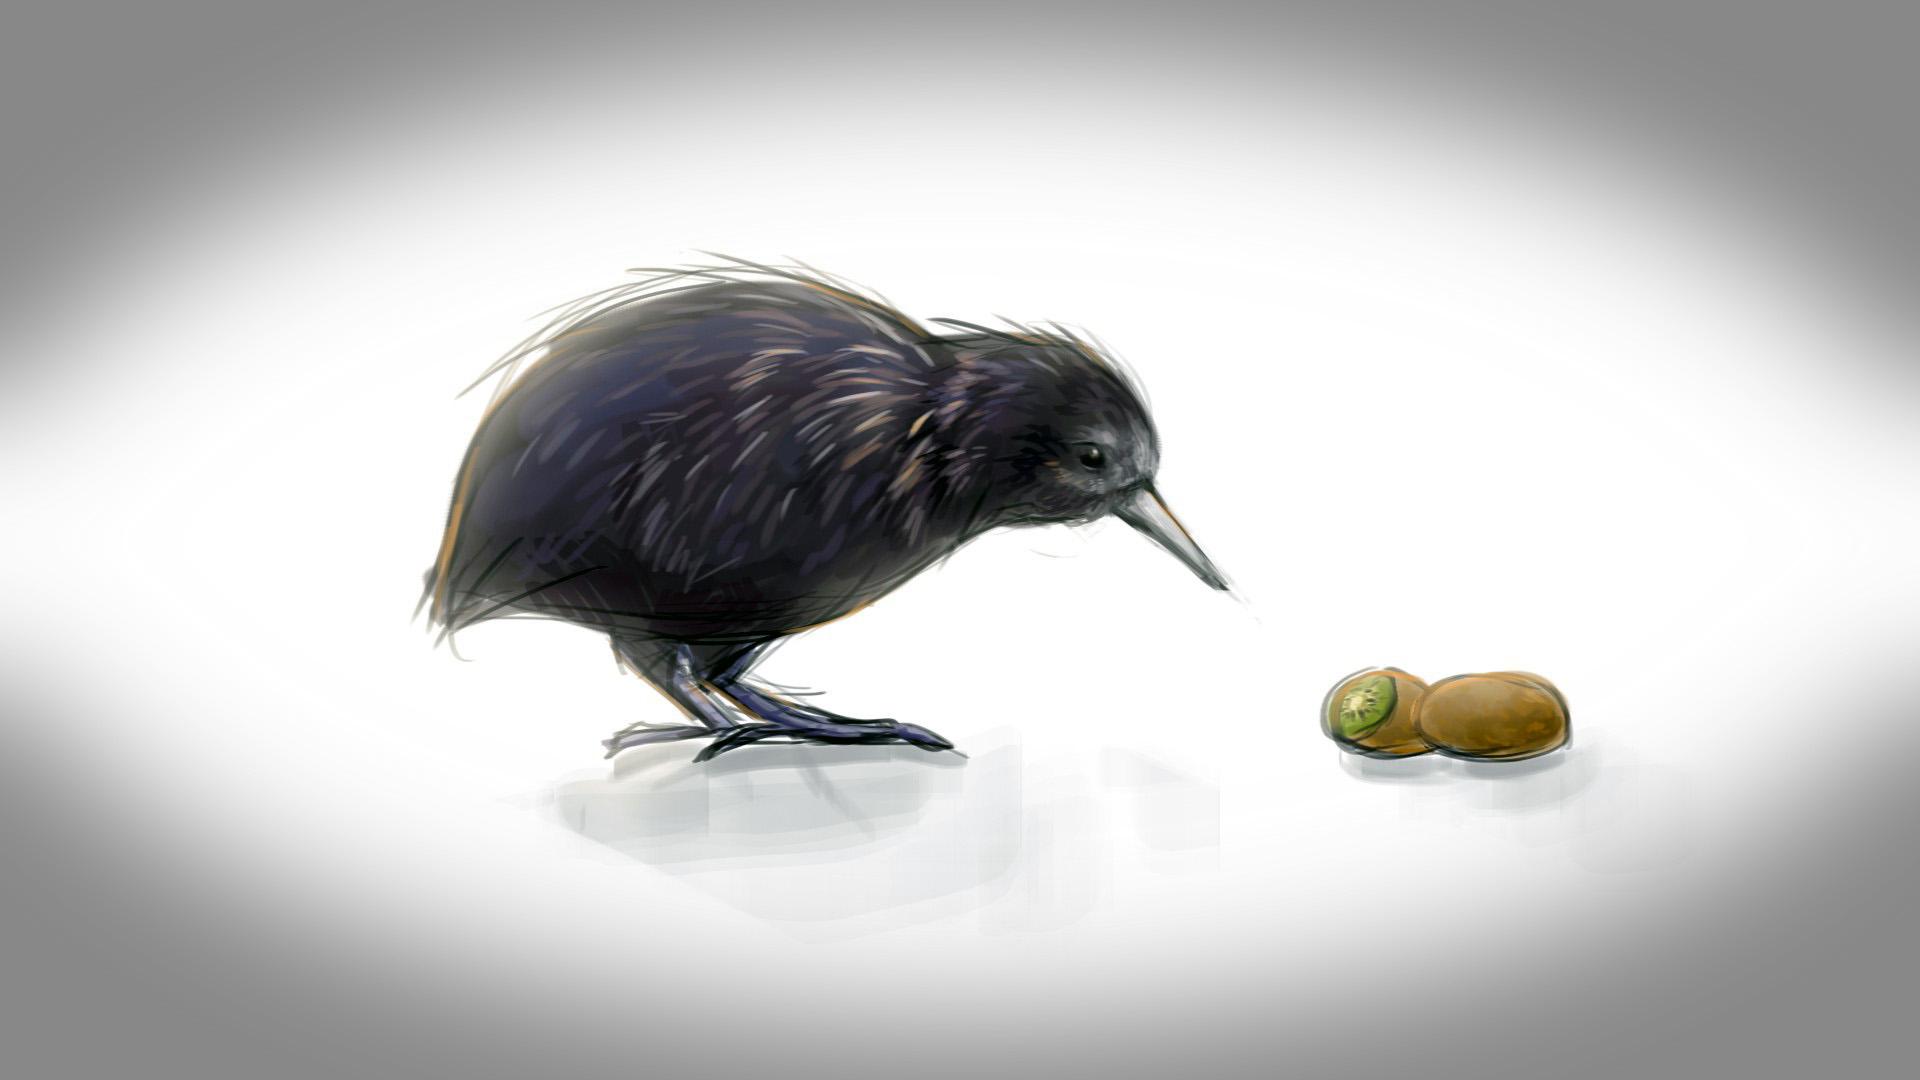 Птица киви full HD, птицы обои на айфон 5, 1920 на 1080 пикселей